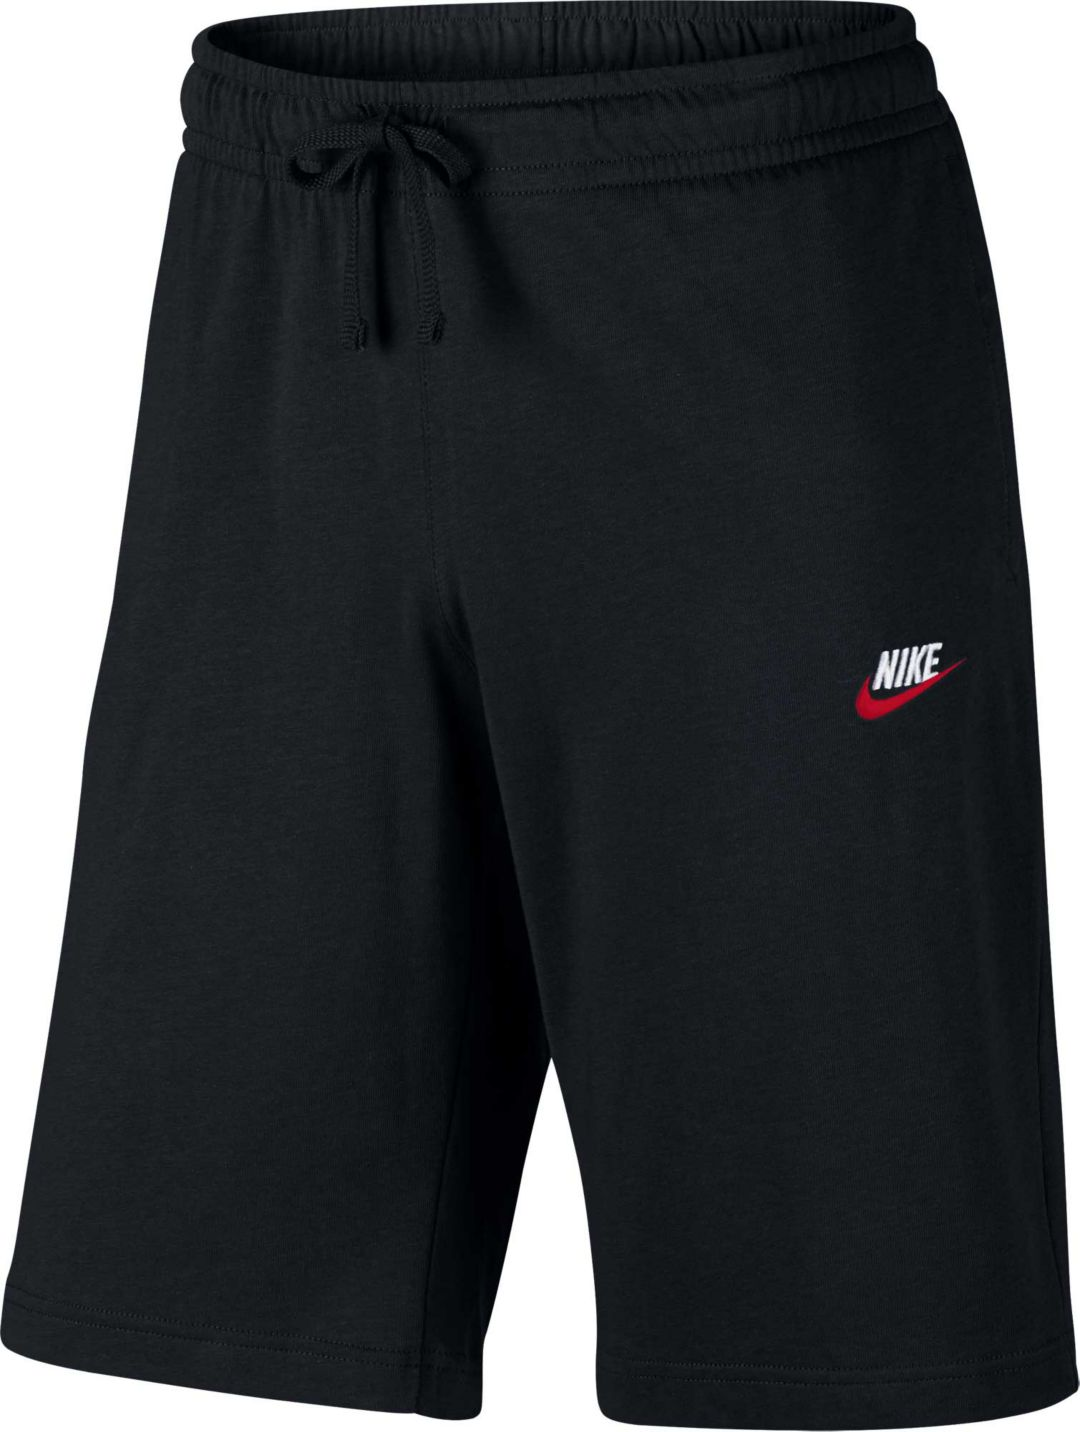 c61bcc3cb7e91b Nike Men's Sportswear Jersey Club Shorts. noImageFound. Previous